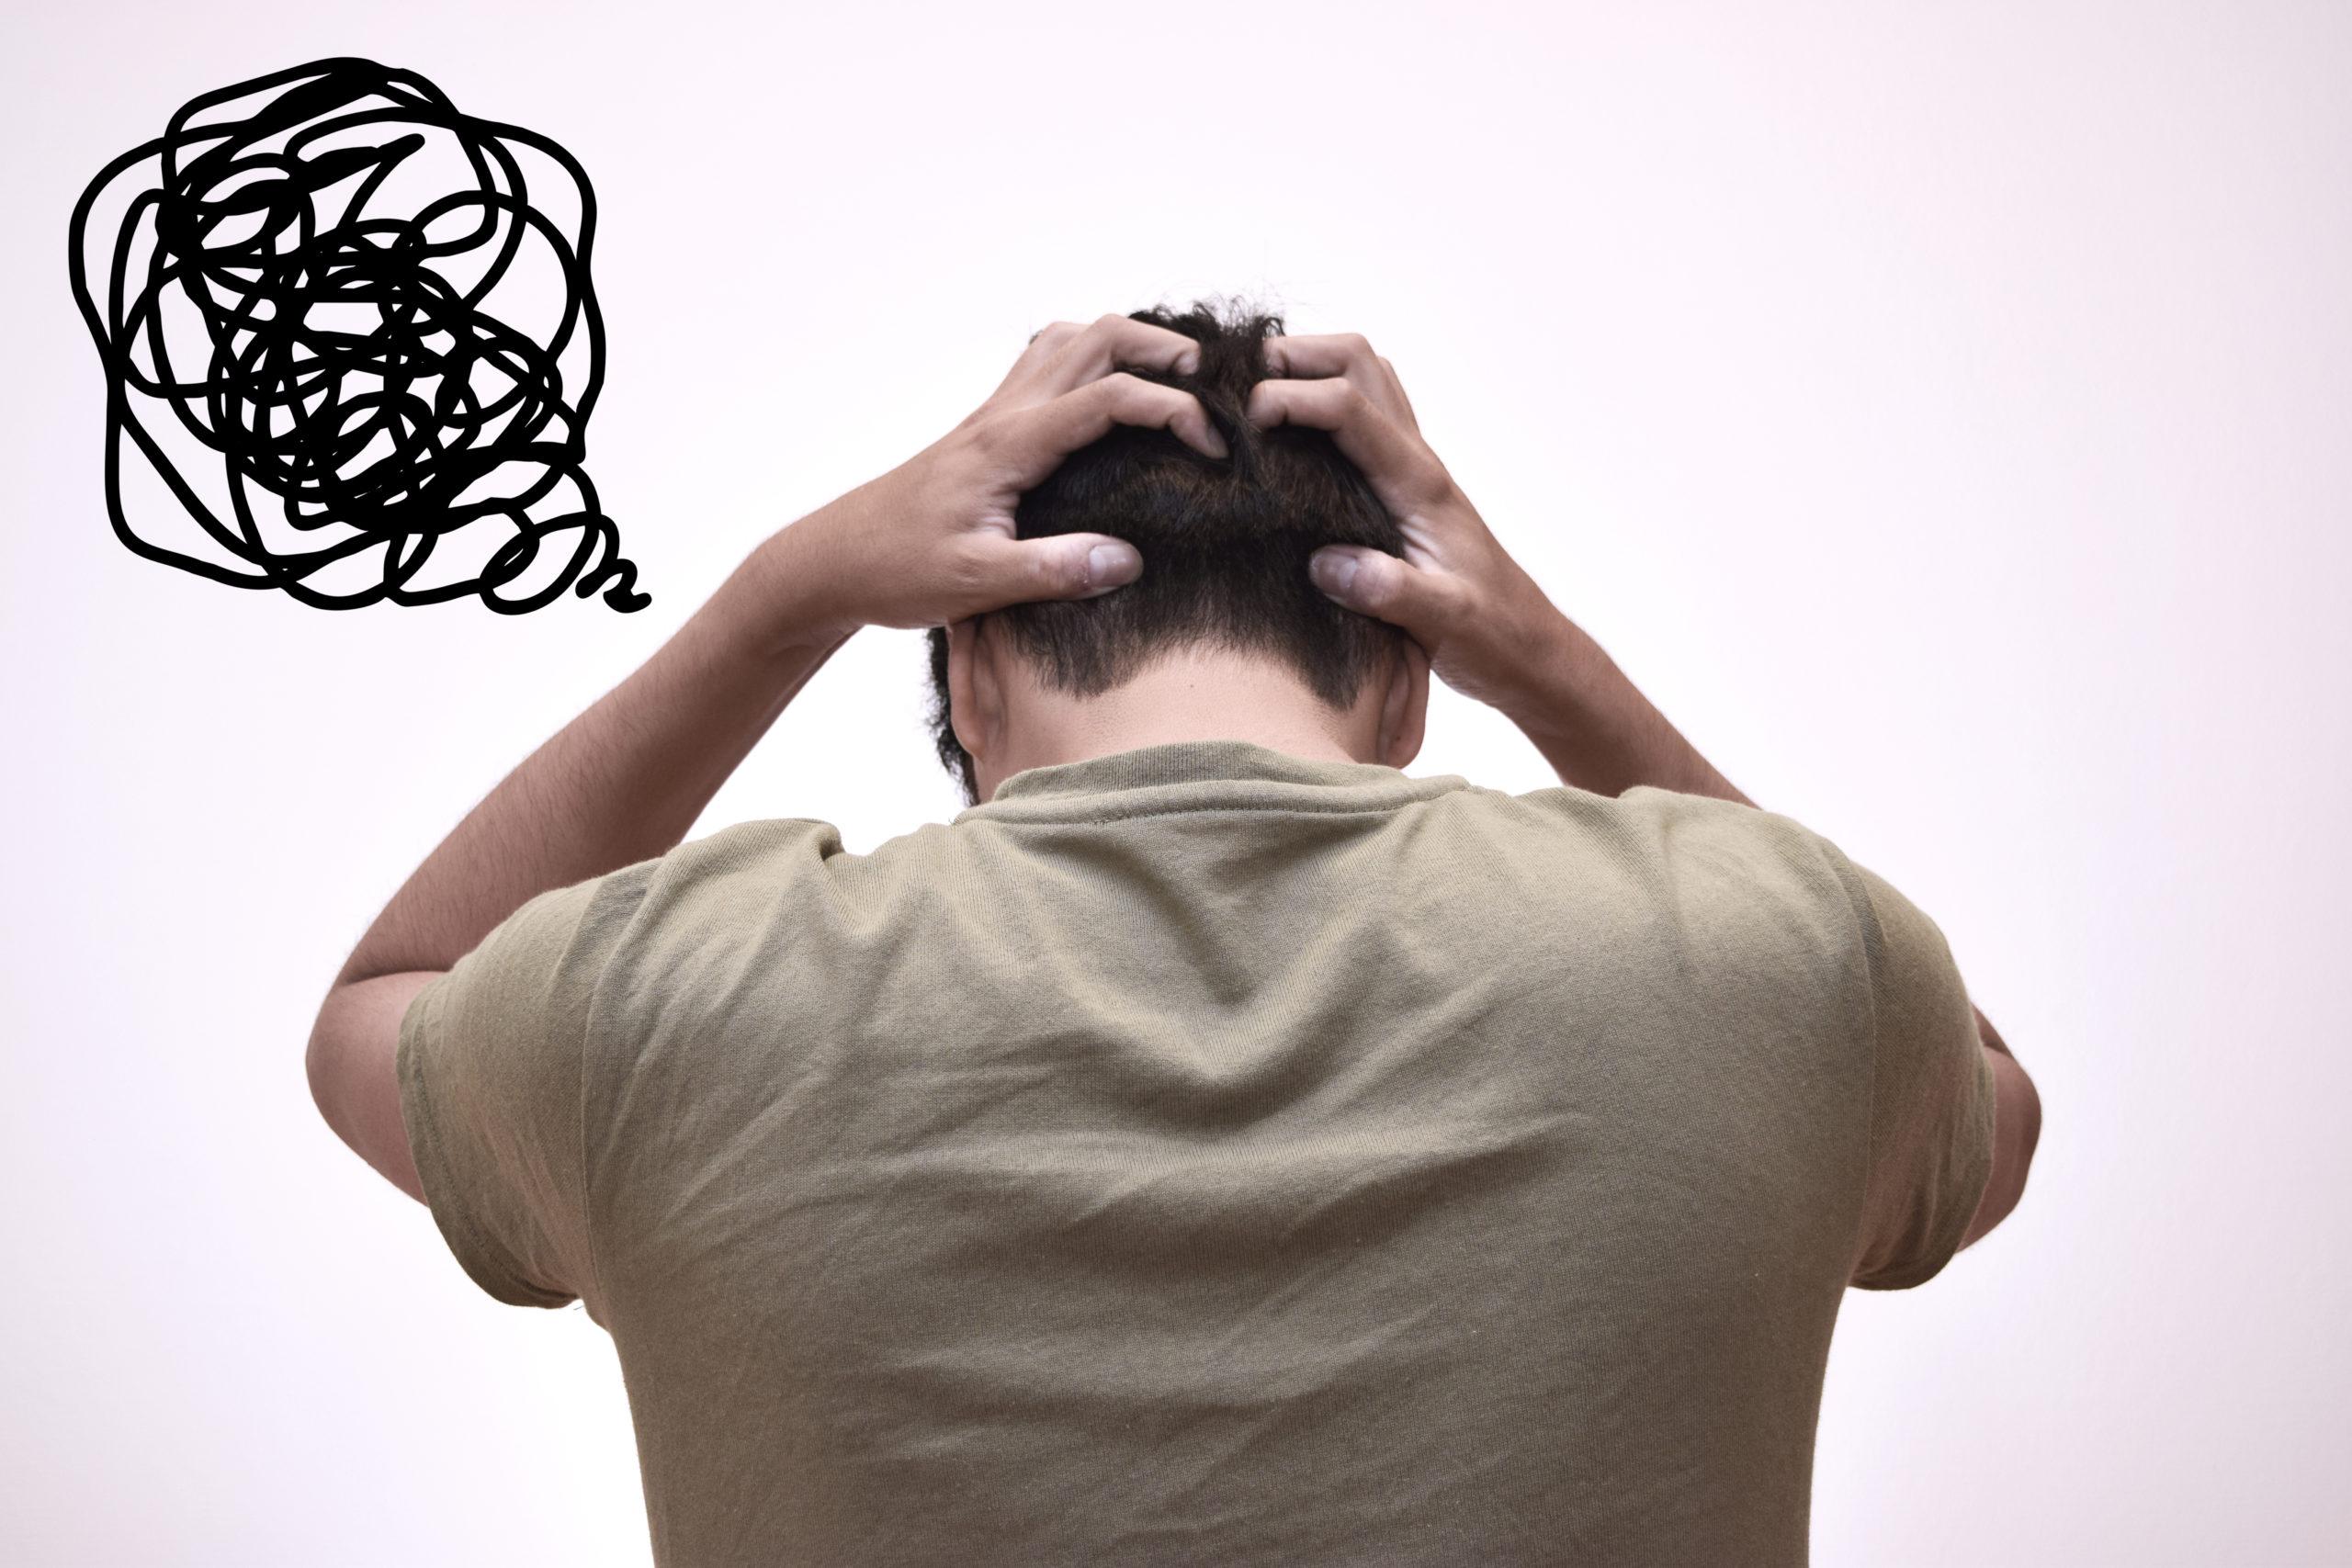 worried-man-touching-his-head-mental-516445780